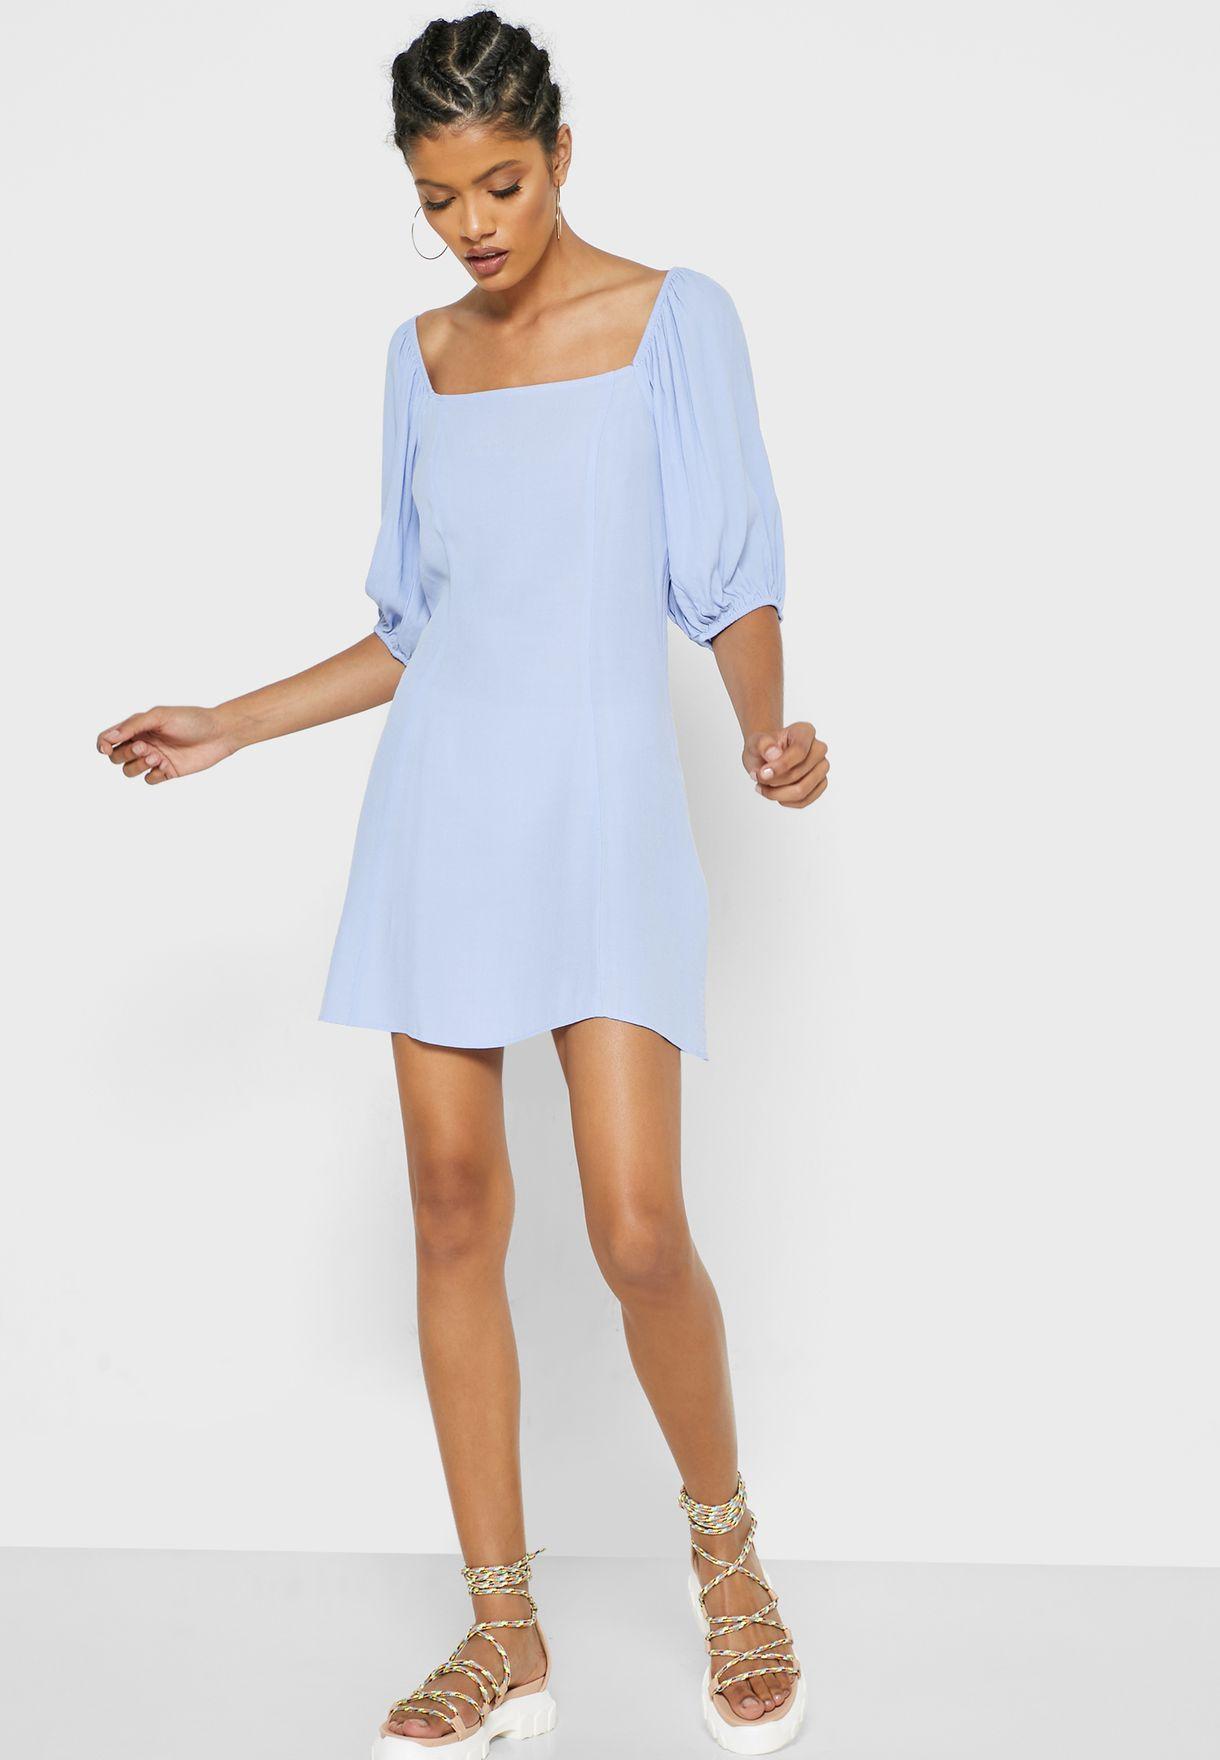 Square Neck Puff Sleeve Dress